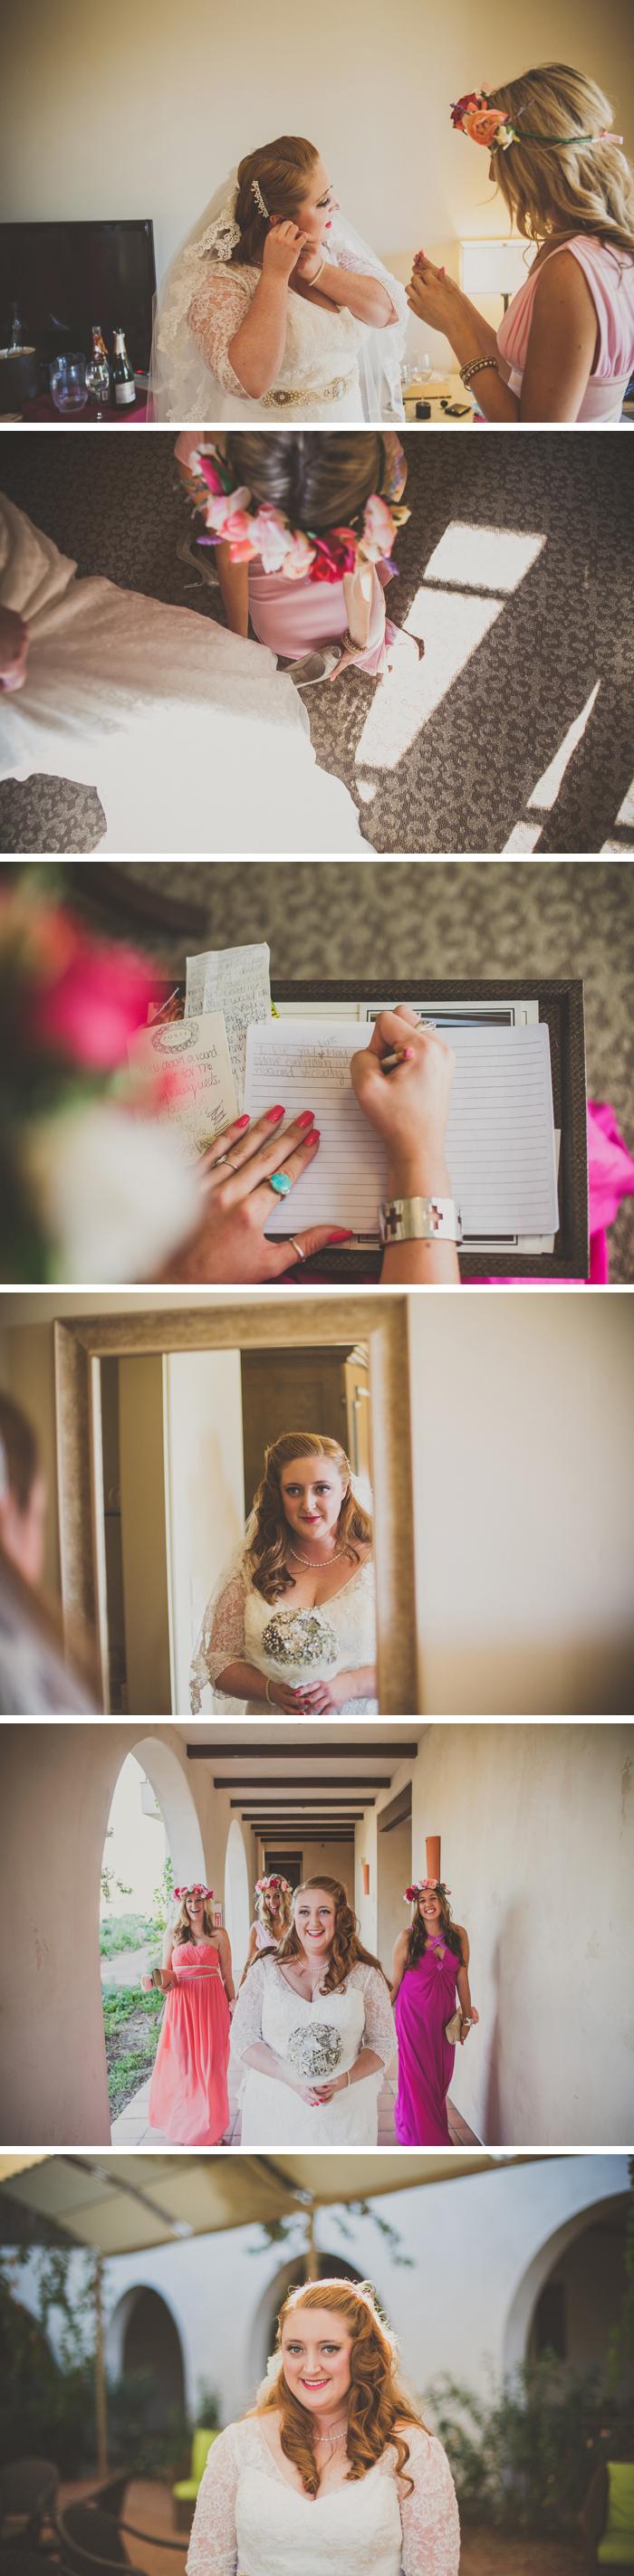 Wedding Photography At Ponte Inn